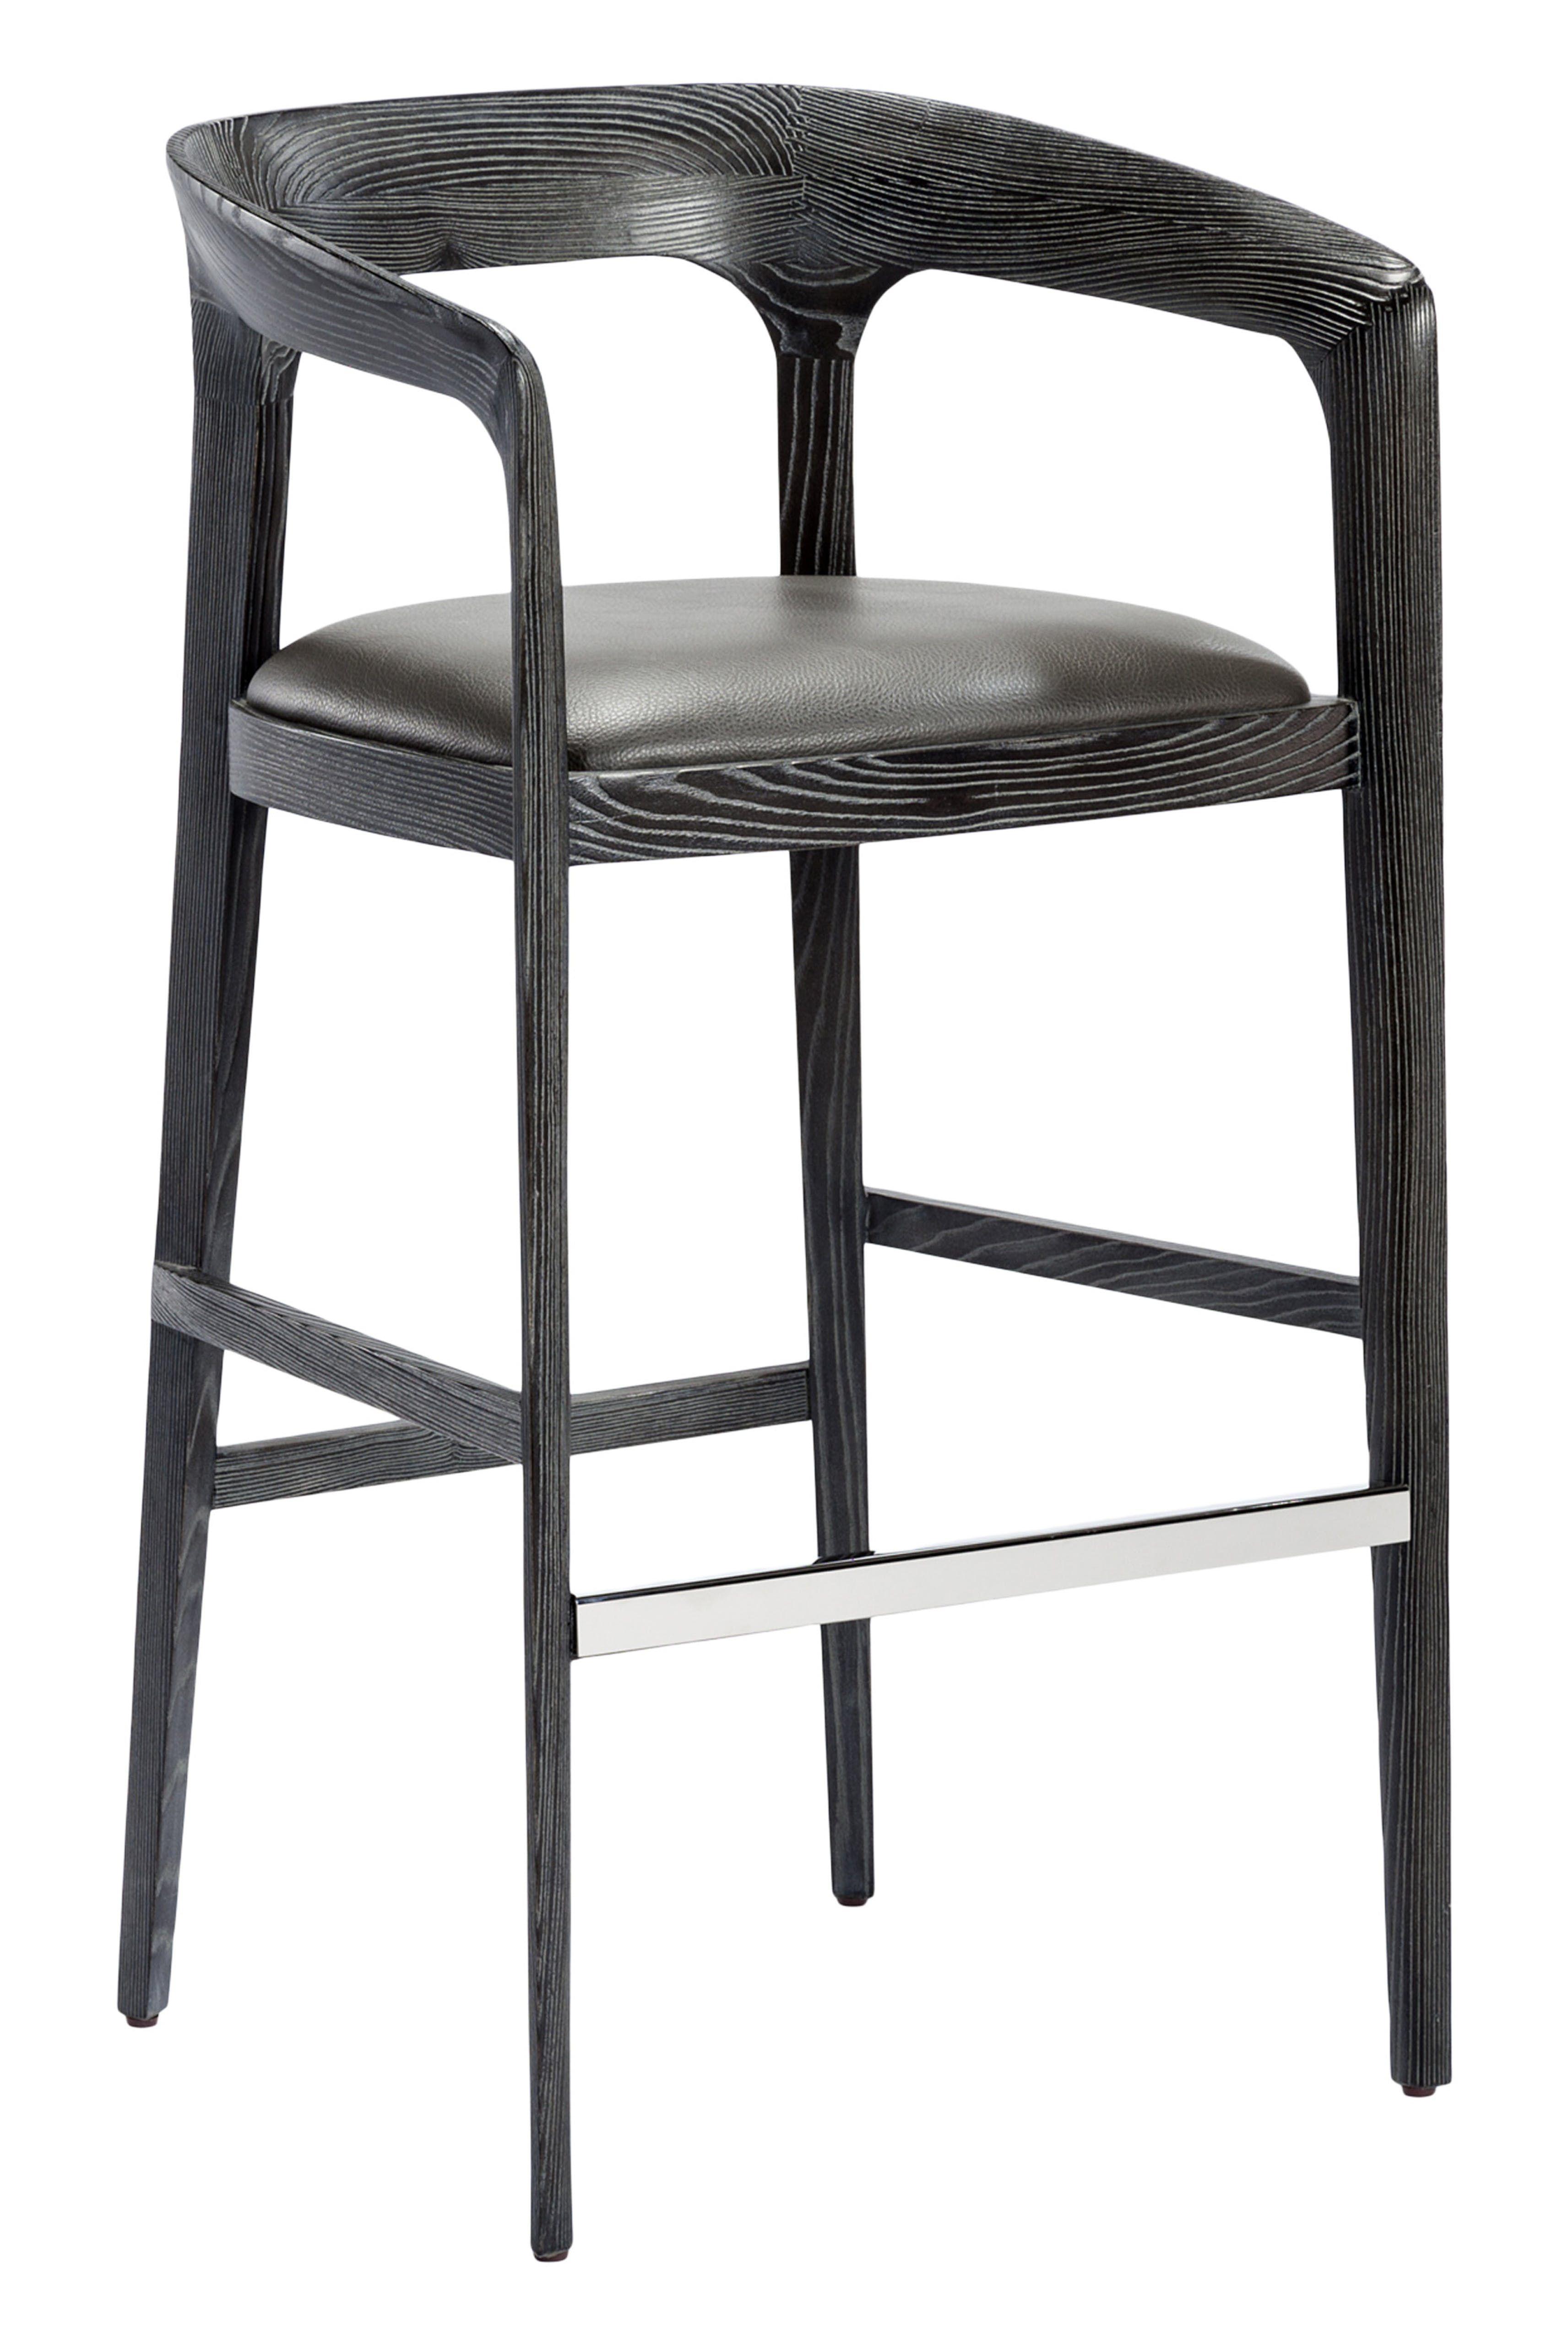 Interlude Home Kendra Bar Stool Grey Furniture Furniture Seating